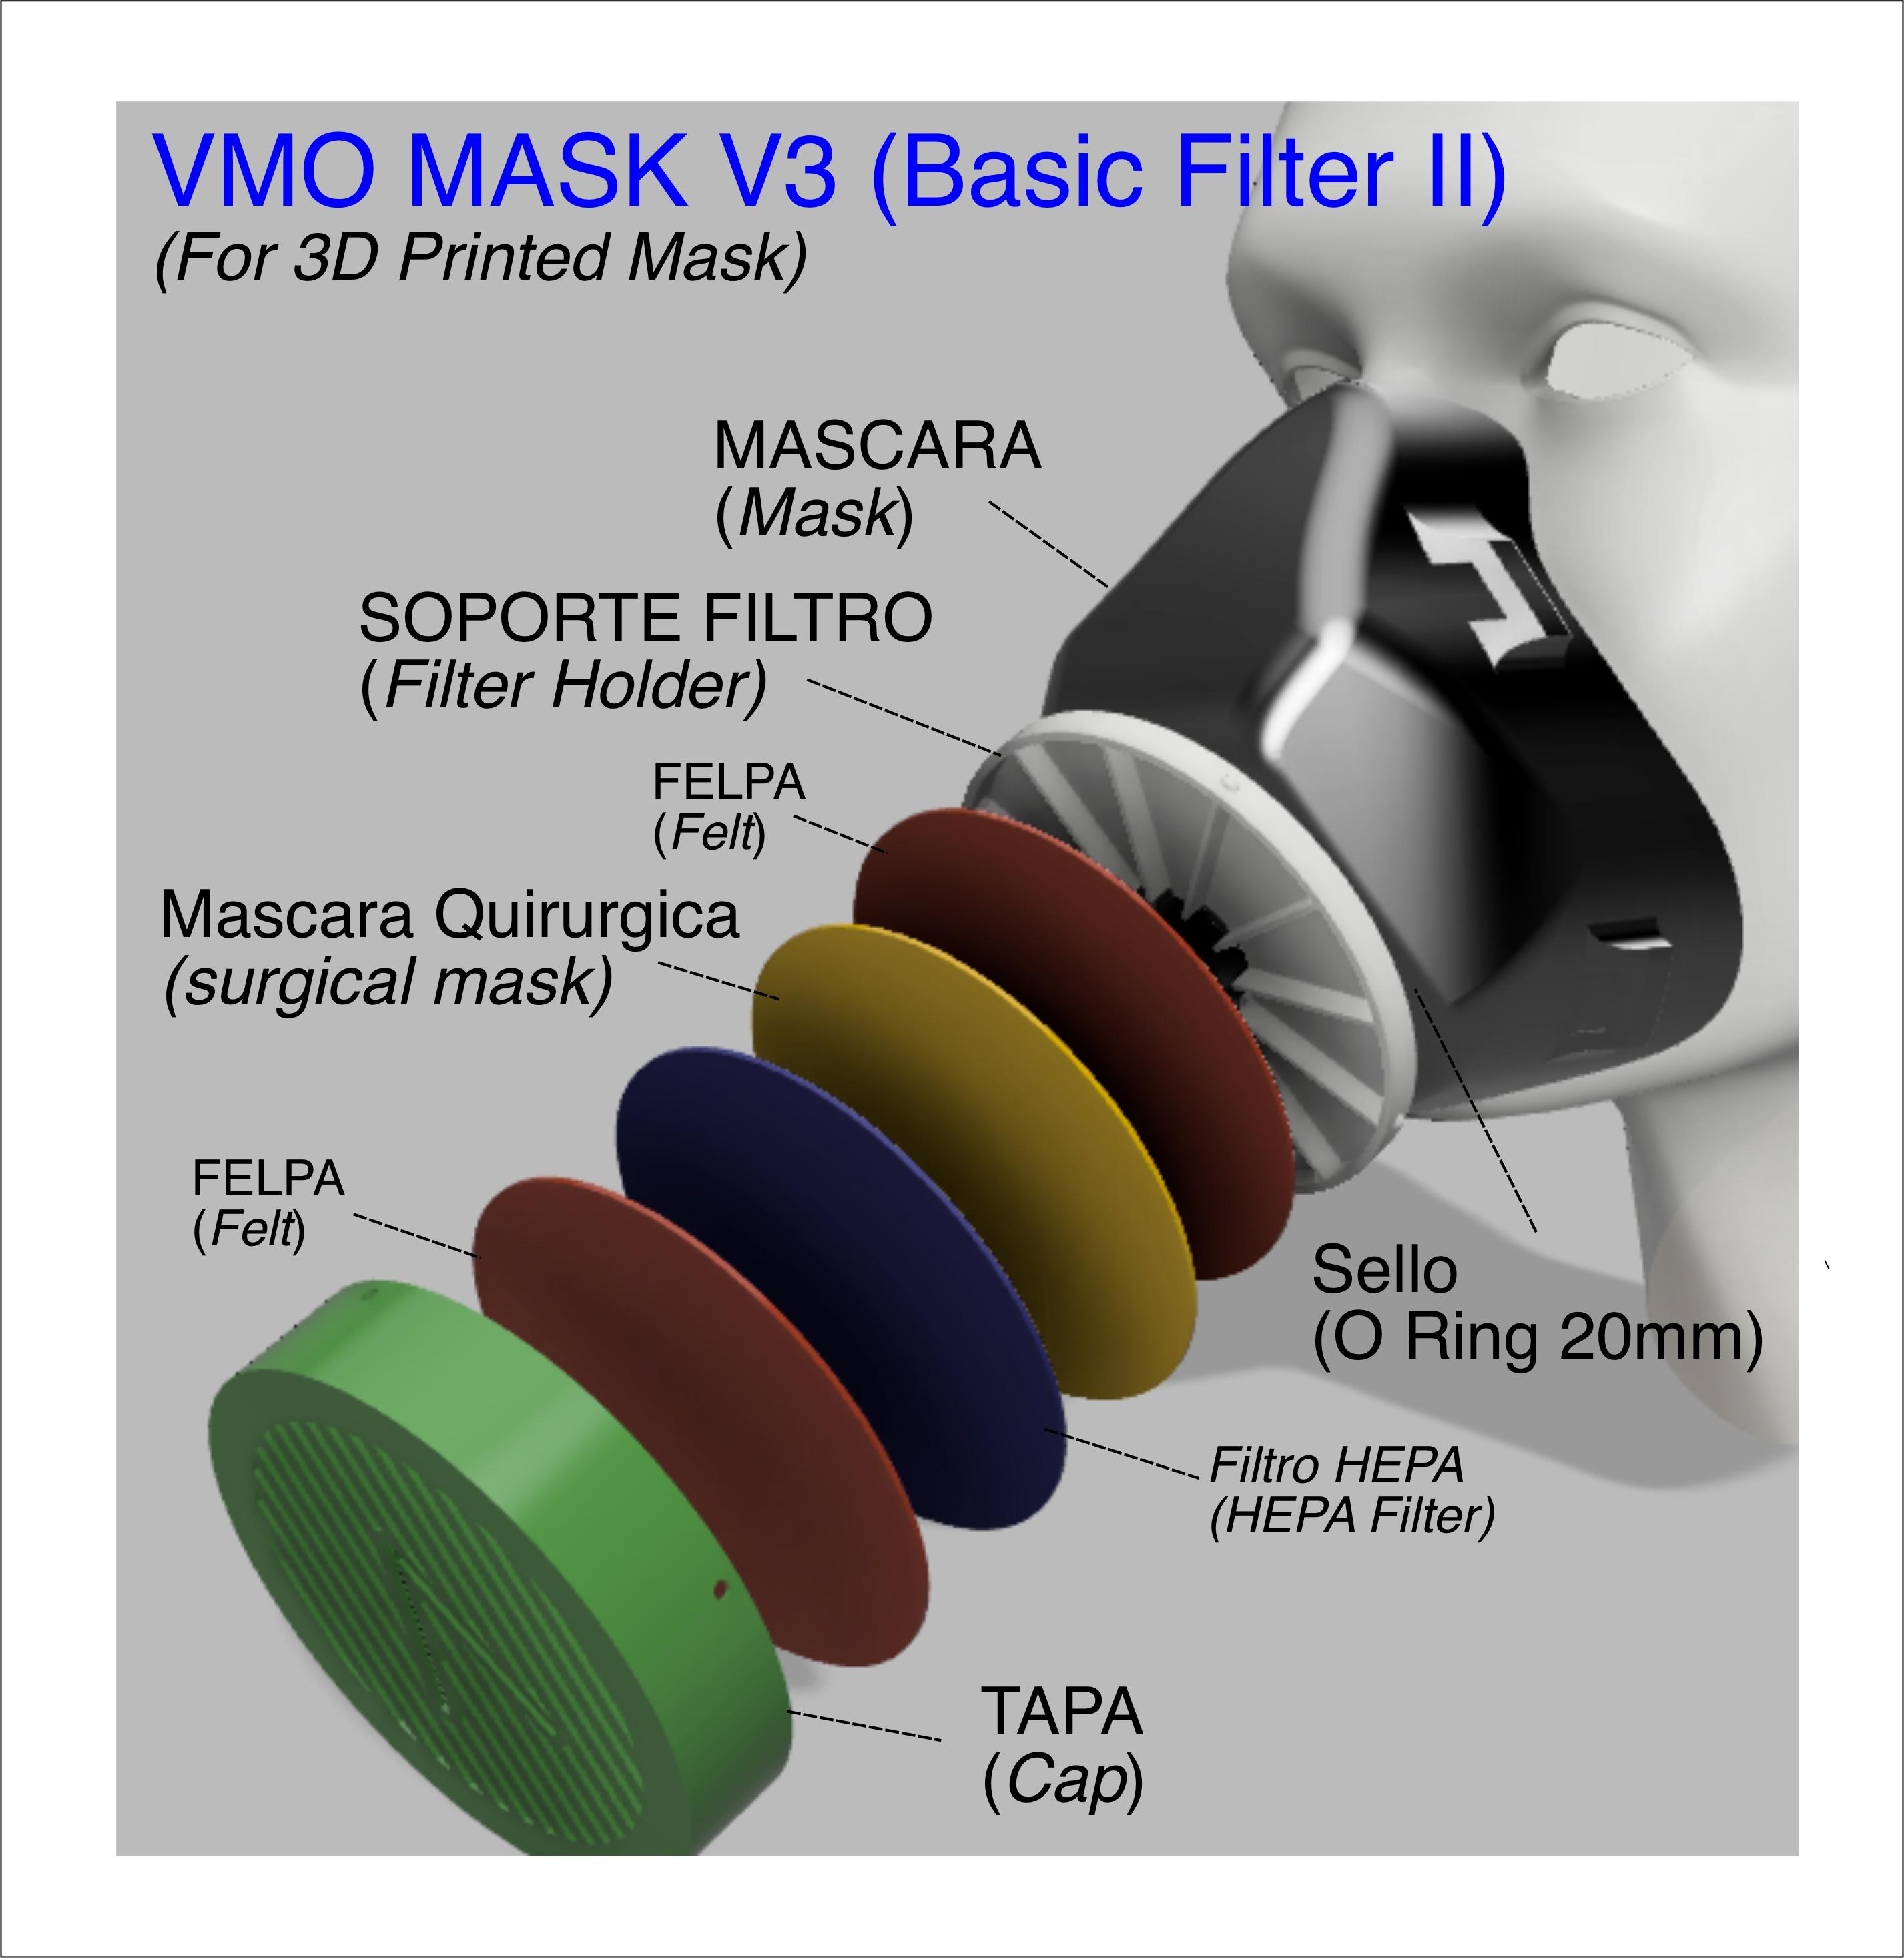 2- Filtro.jpg Download free STL file  VMO MASK V3 - 3D-PRINTED PROTECTIVE- Coronavirus COVID-19 (Improved Version) • Model to 3D print, victorottati